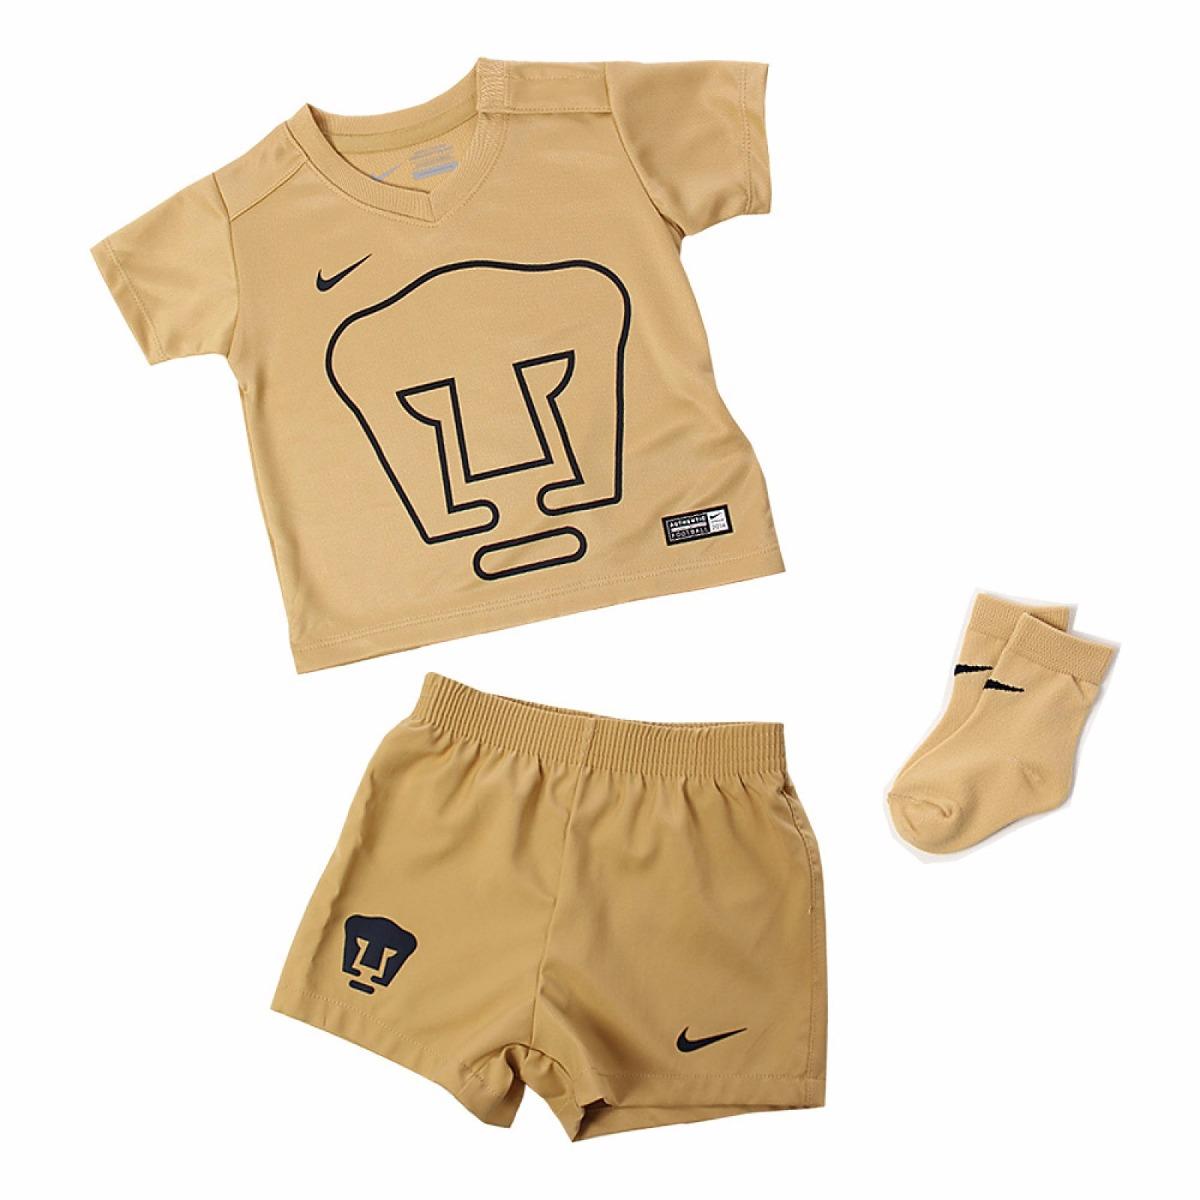 Nike kit pumas unam para ni os 12 18 meses en - Cenas rapidas para ninos de 18 meses ...